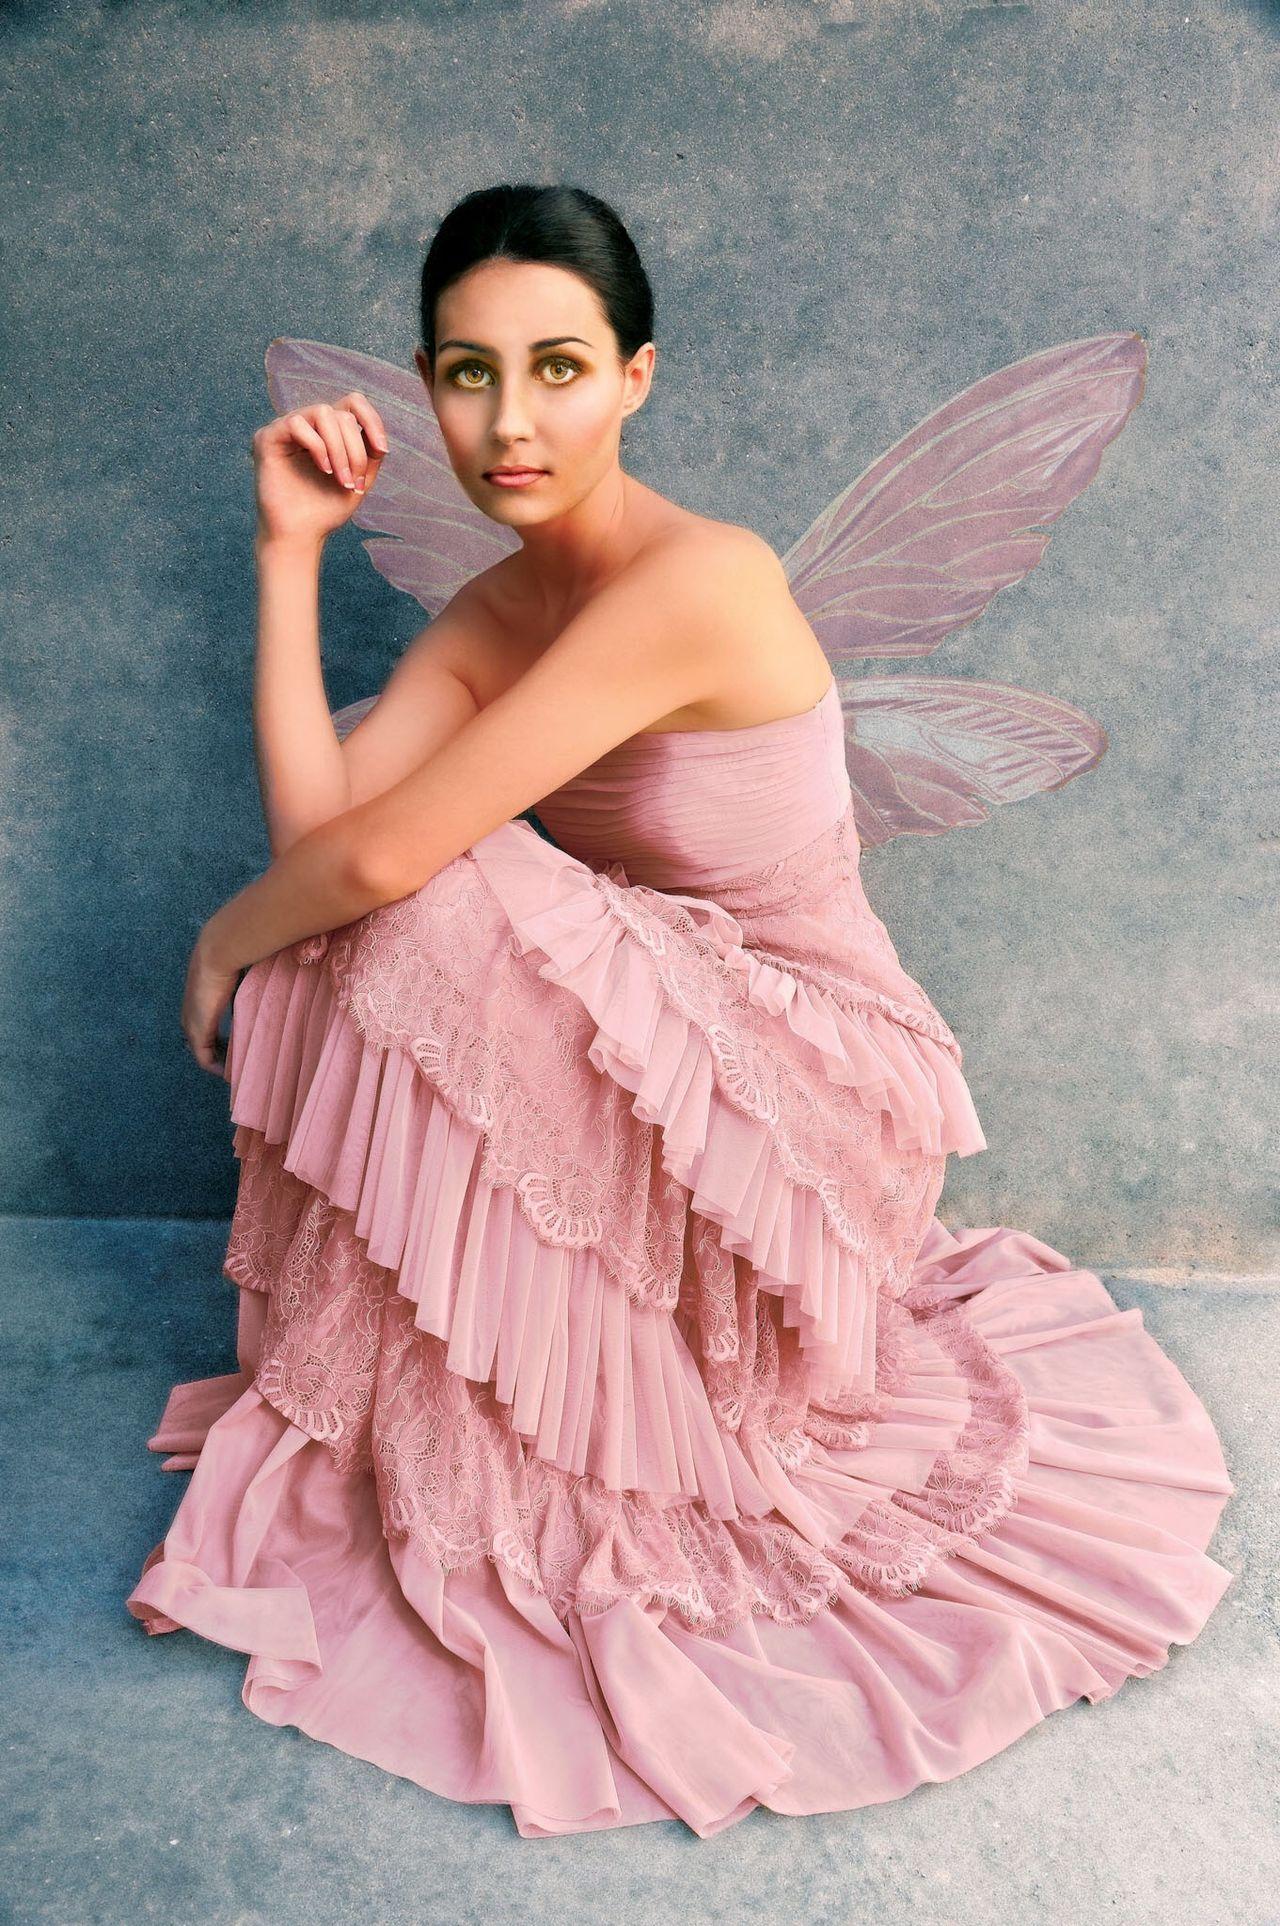 Beautiful stock photos of australien, 20-24 Years, Beautiful People, Beautiful Woman, Caucasian Ethnicity